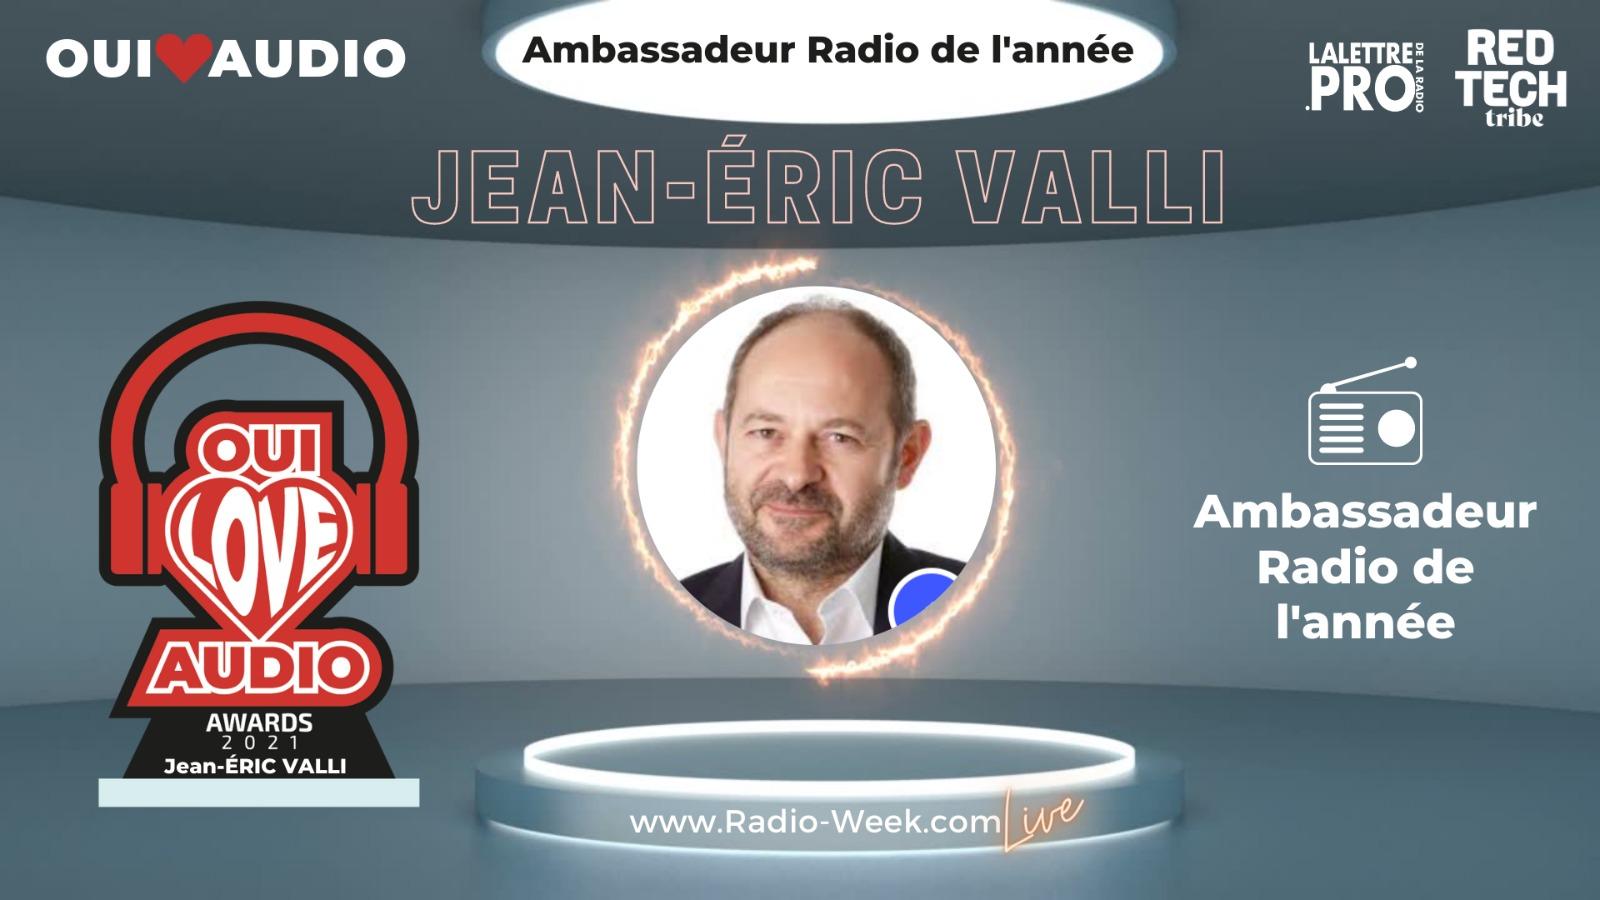 #RadioWeek : Sandrine Treiner et Jean-Éric Valli récompensés